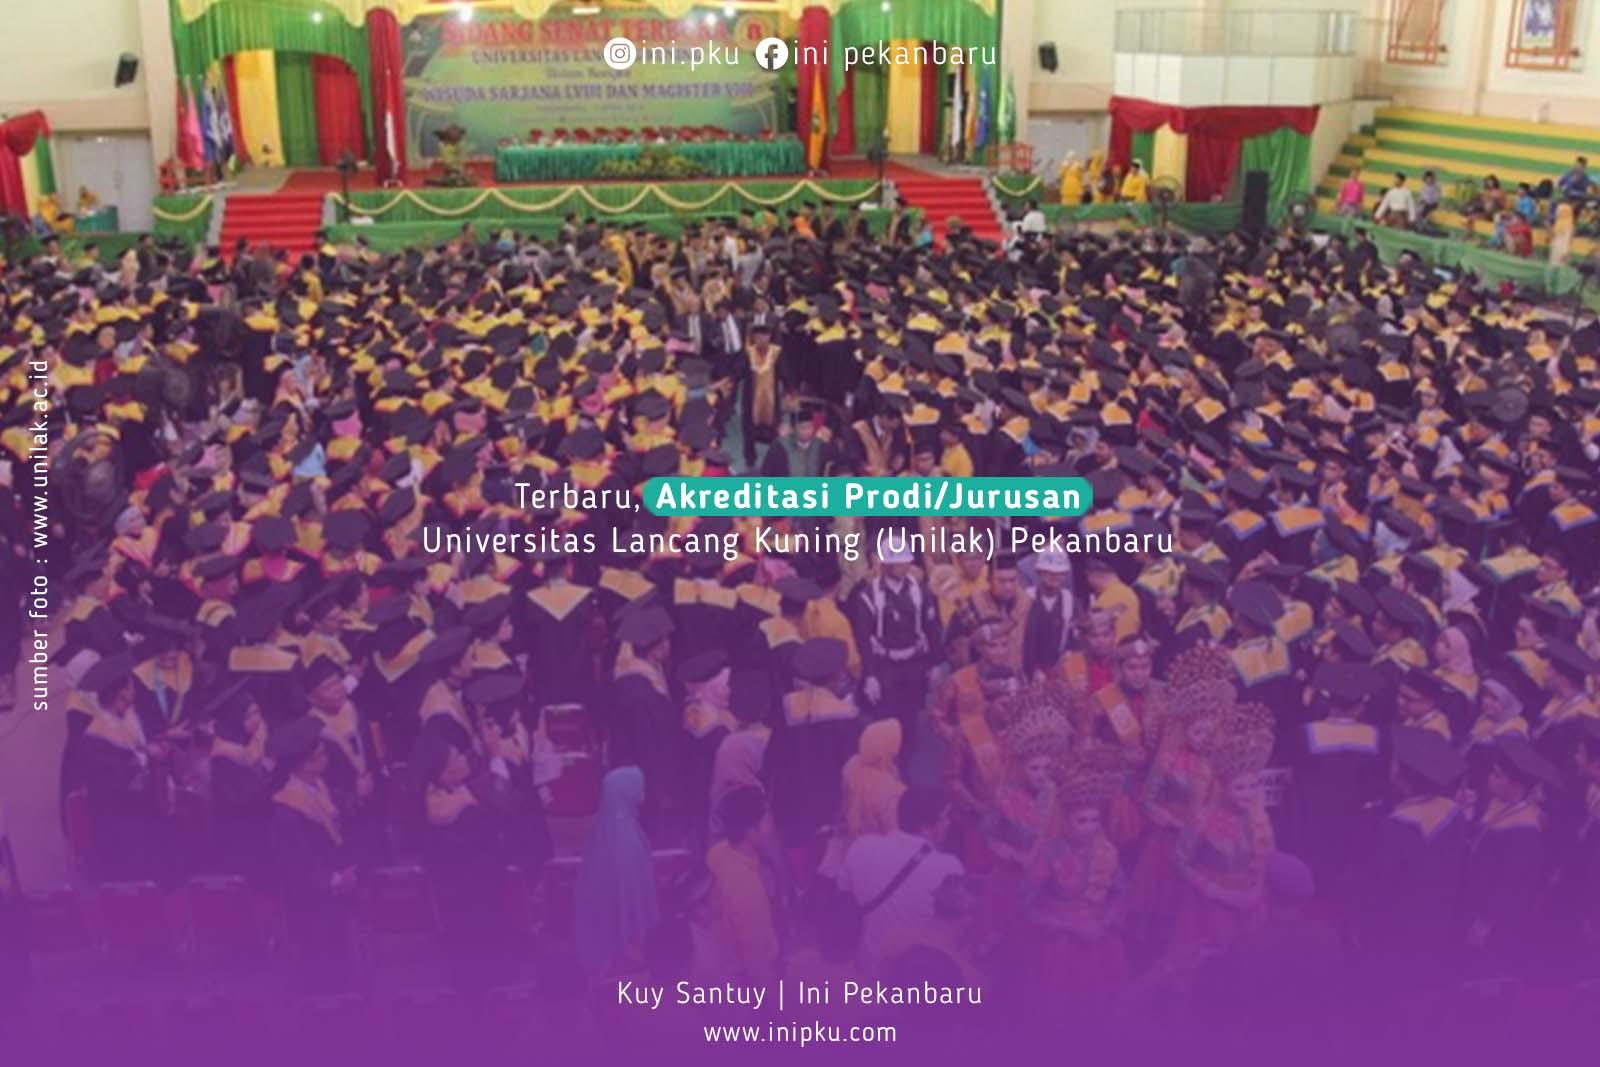 Terbaru, Akreditasi Prodi/Jurusan Universitas Lancang Kuning (Unilak) Pekanbaru